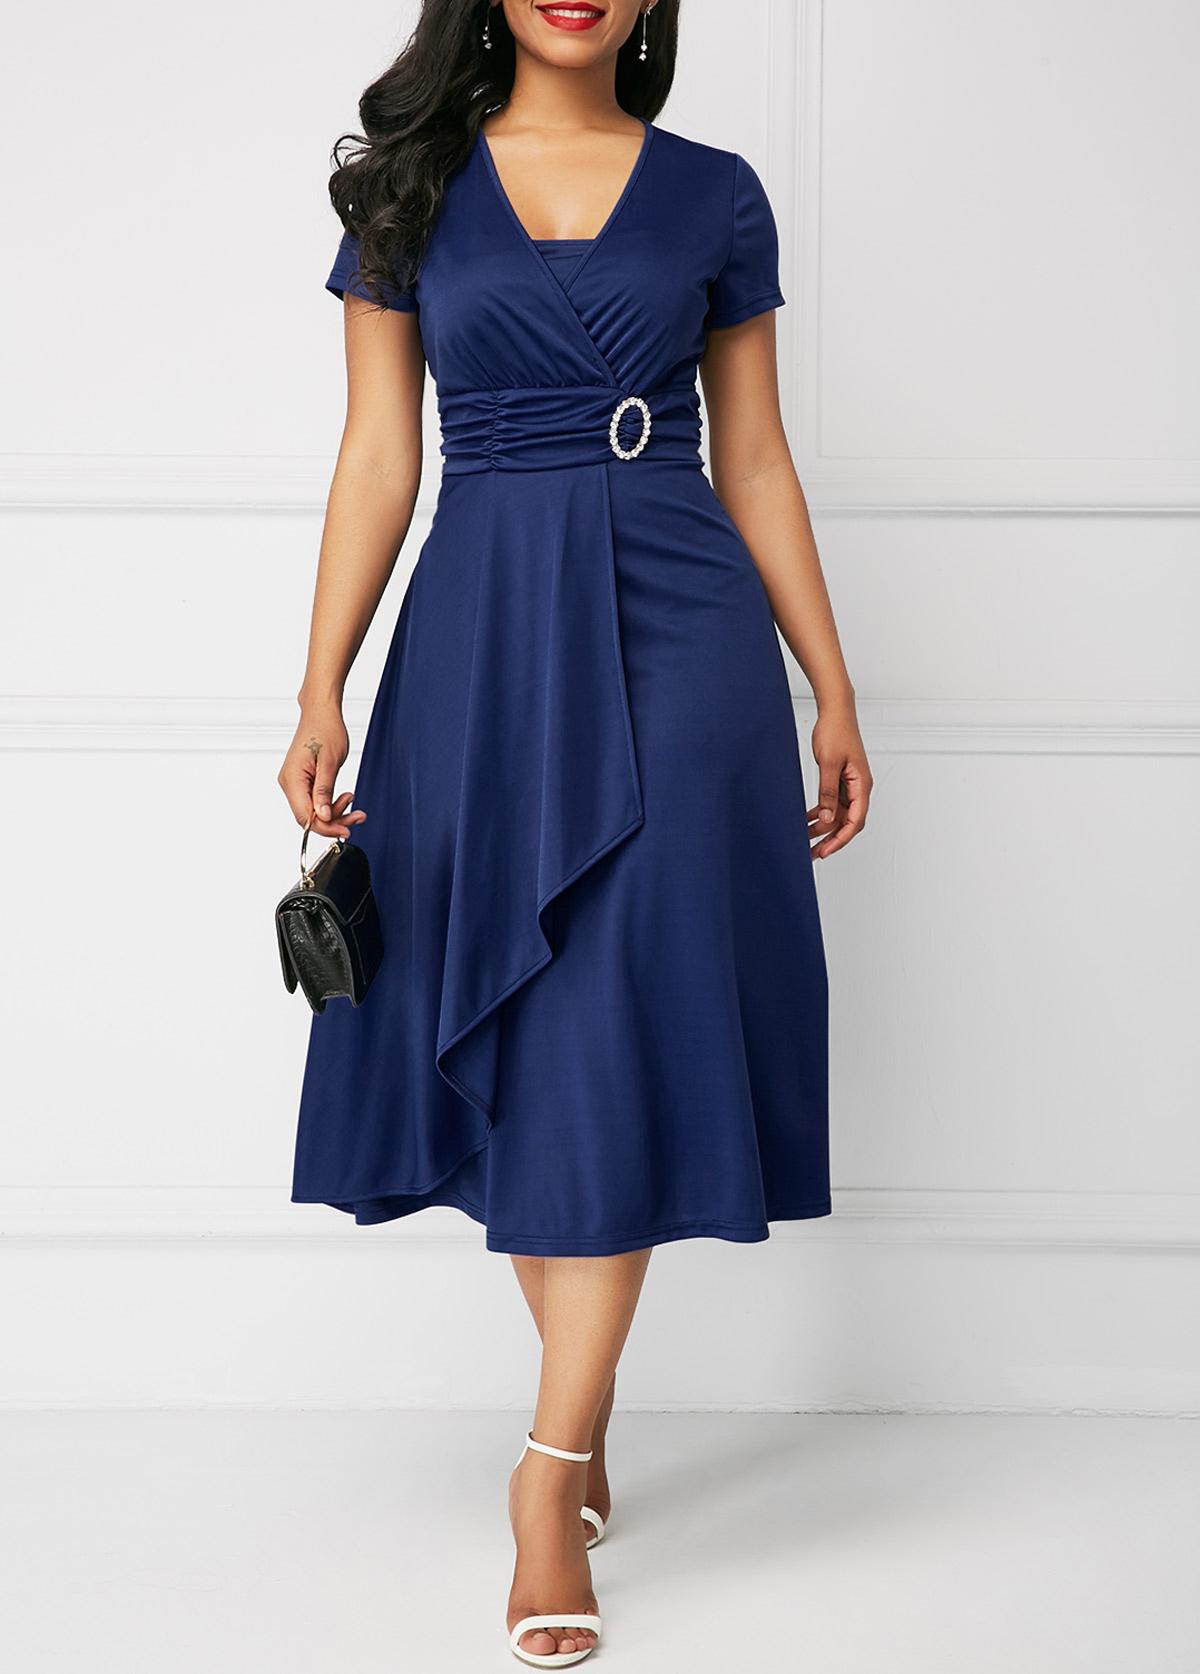 ROTITA Buckle Detail Layered Hem A Line Dress